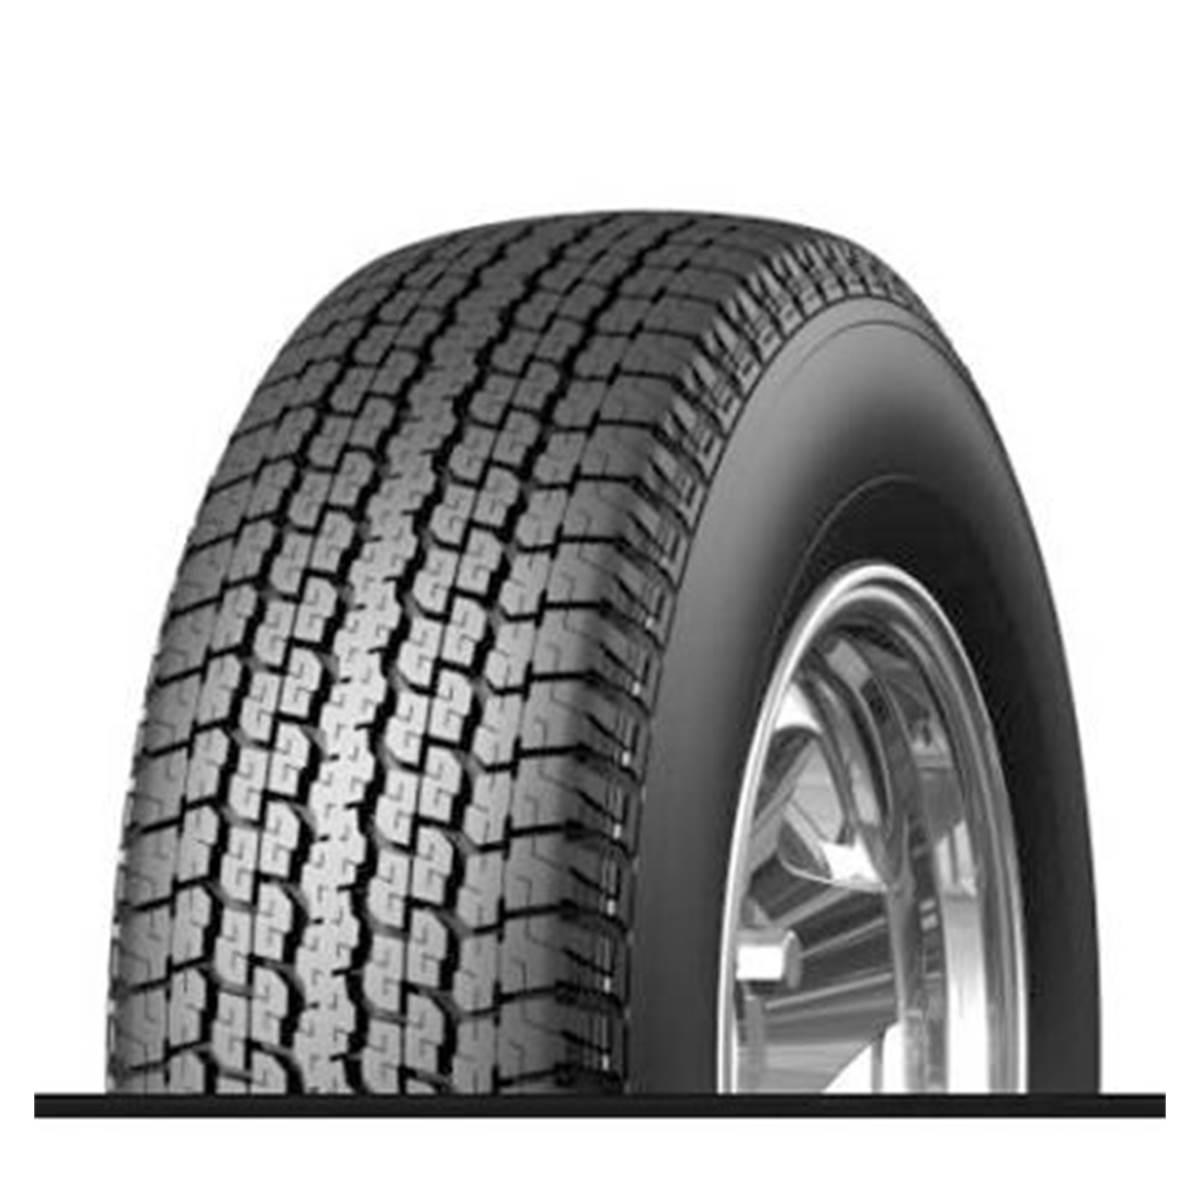 Pneu 4X4 Bridgestone 255/60R18 108H Dueler D840